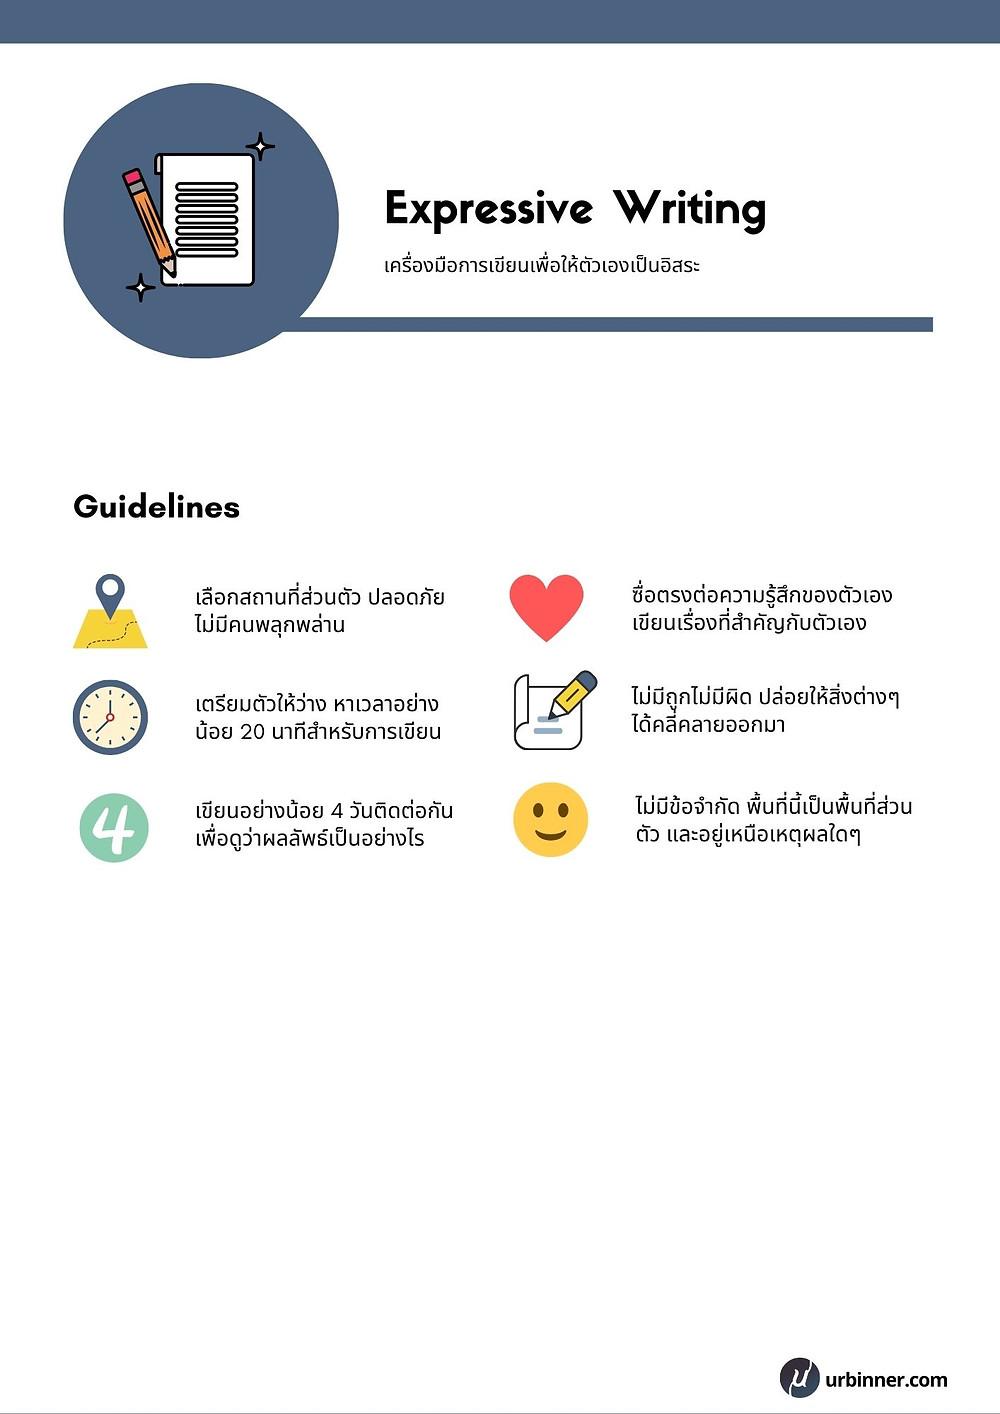 Expressive Writing Template สำหรับการเขียนเพื่อเยียวยาความรู้สึก ปัญหาของคุณ